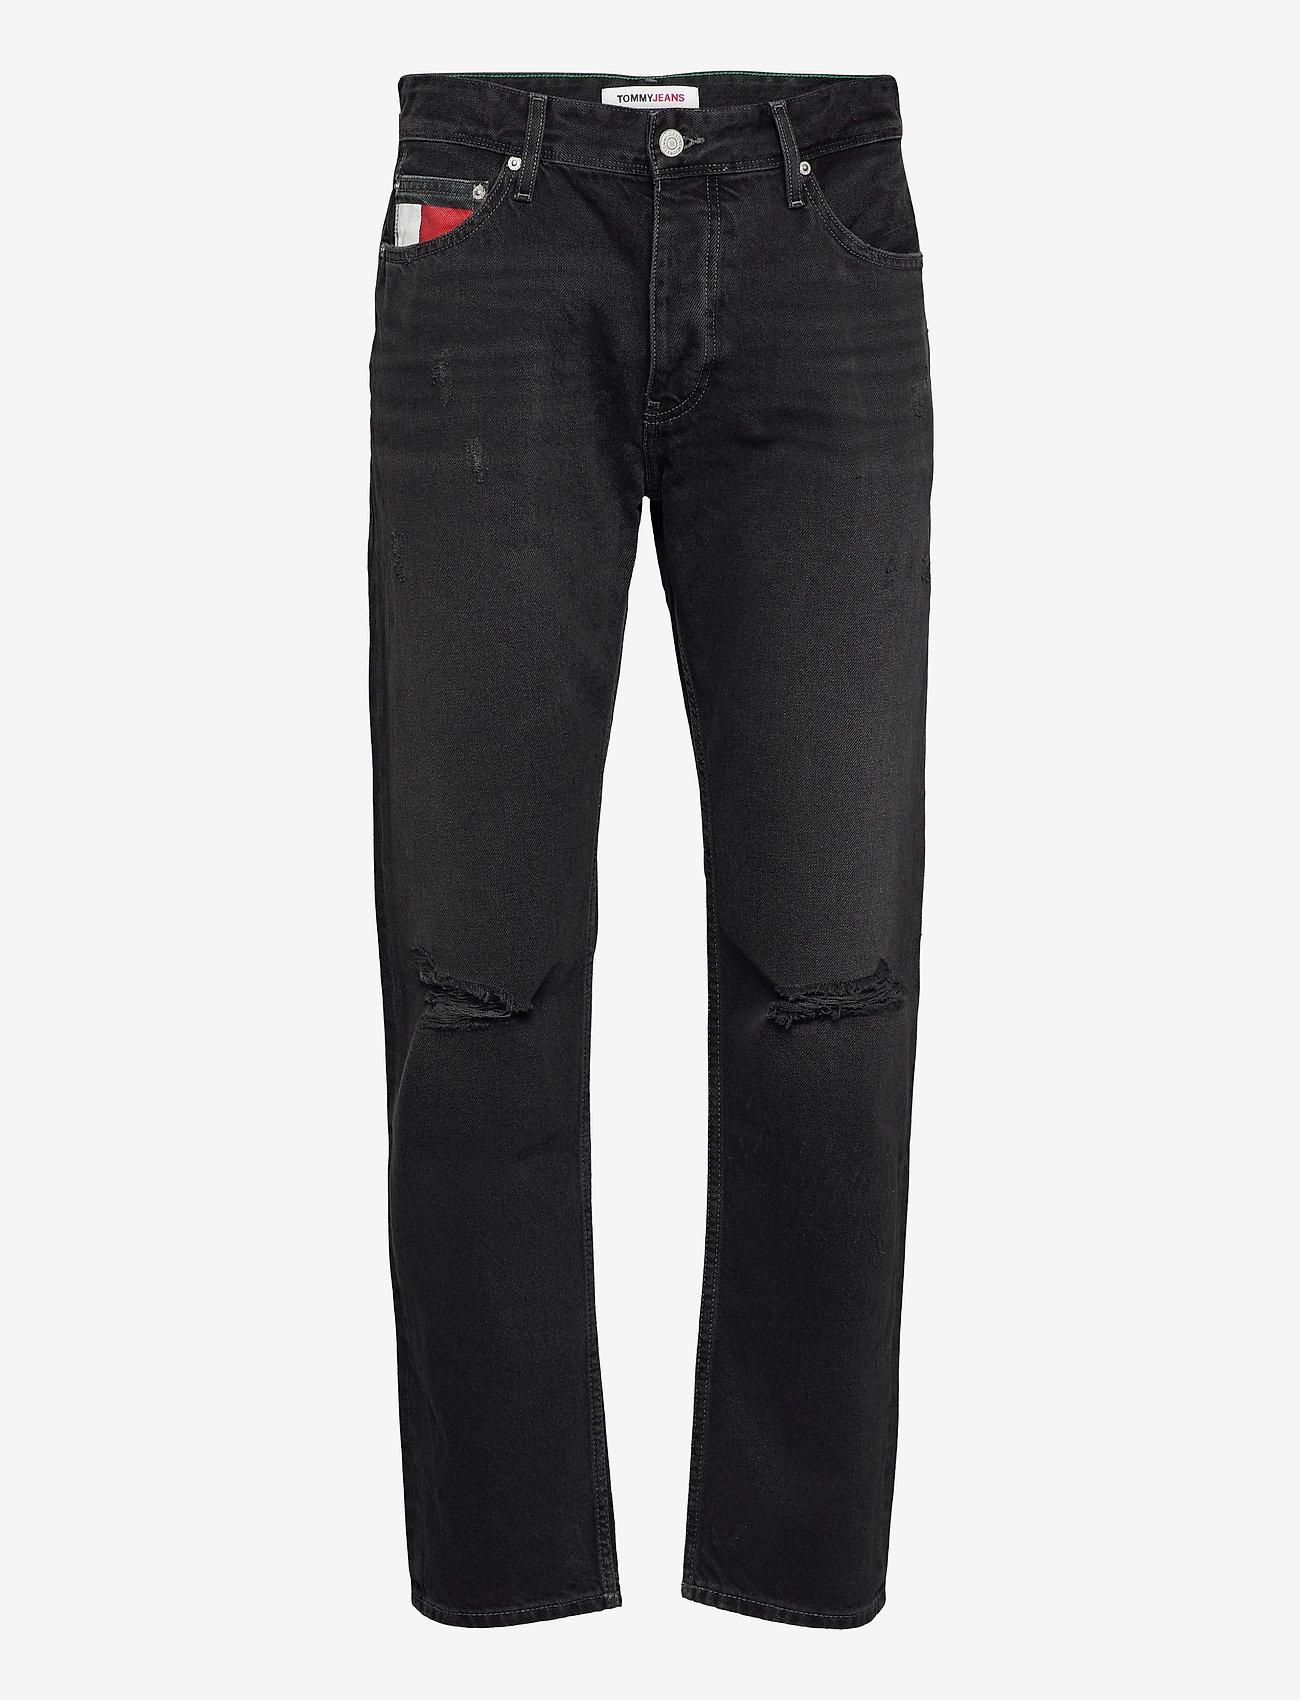 Tommy Jeans - ETHAN RLXD STRAIGHT SSPBBRSD - relaxed jeans - save sp bk bk rgd spr destr - 0